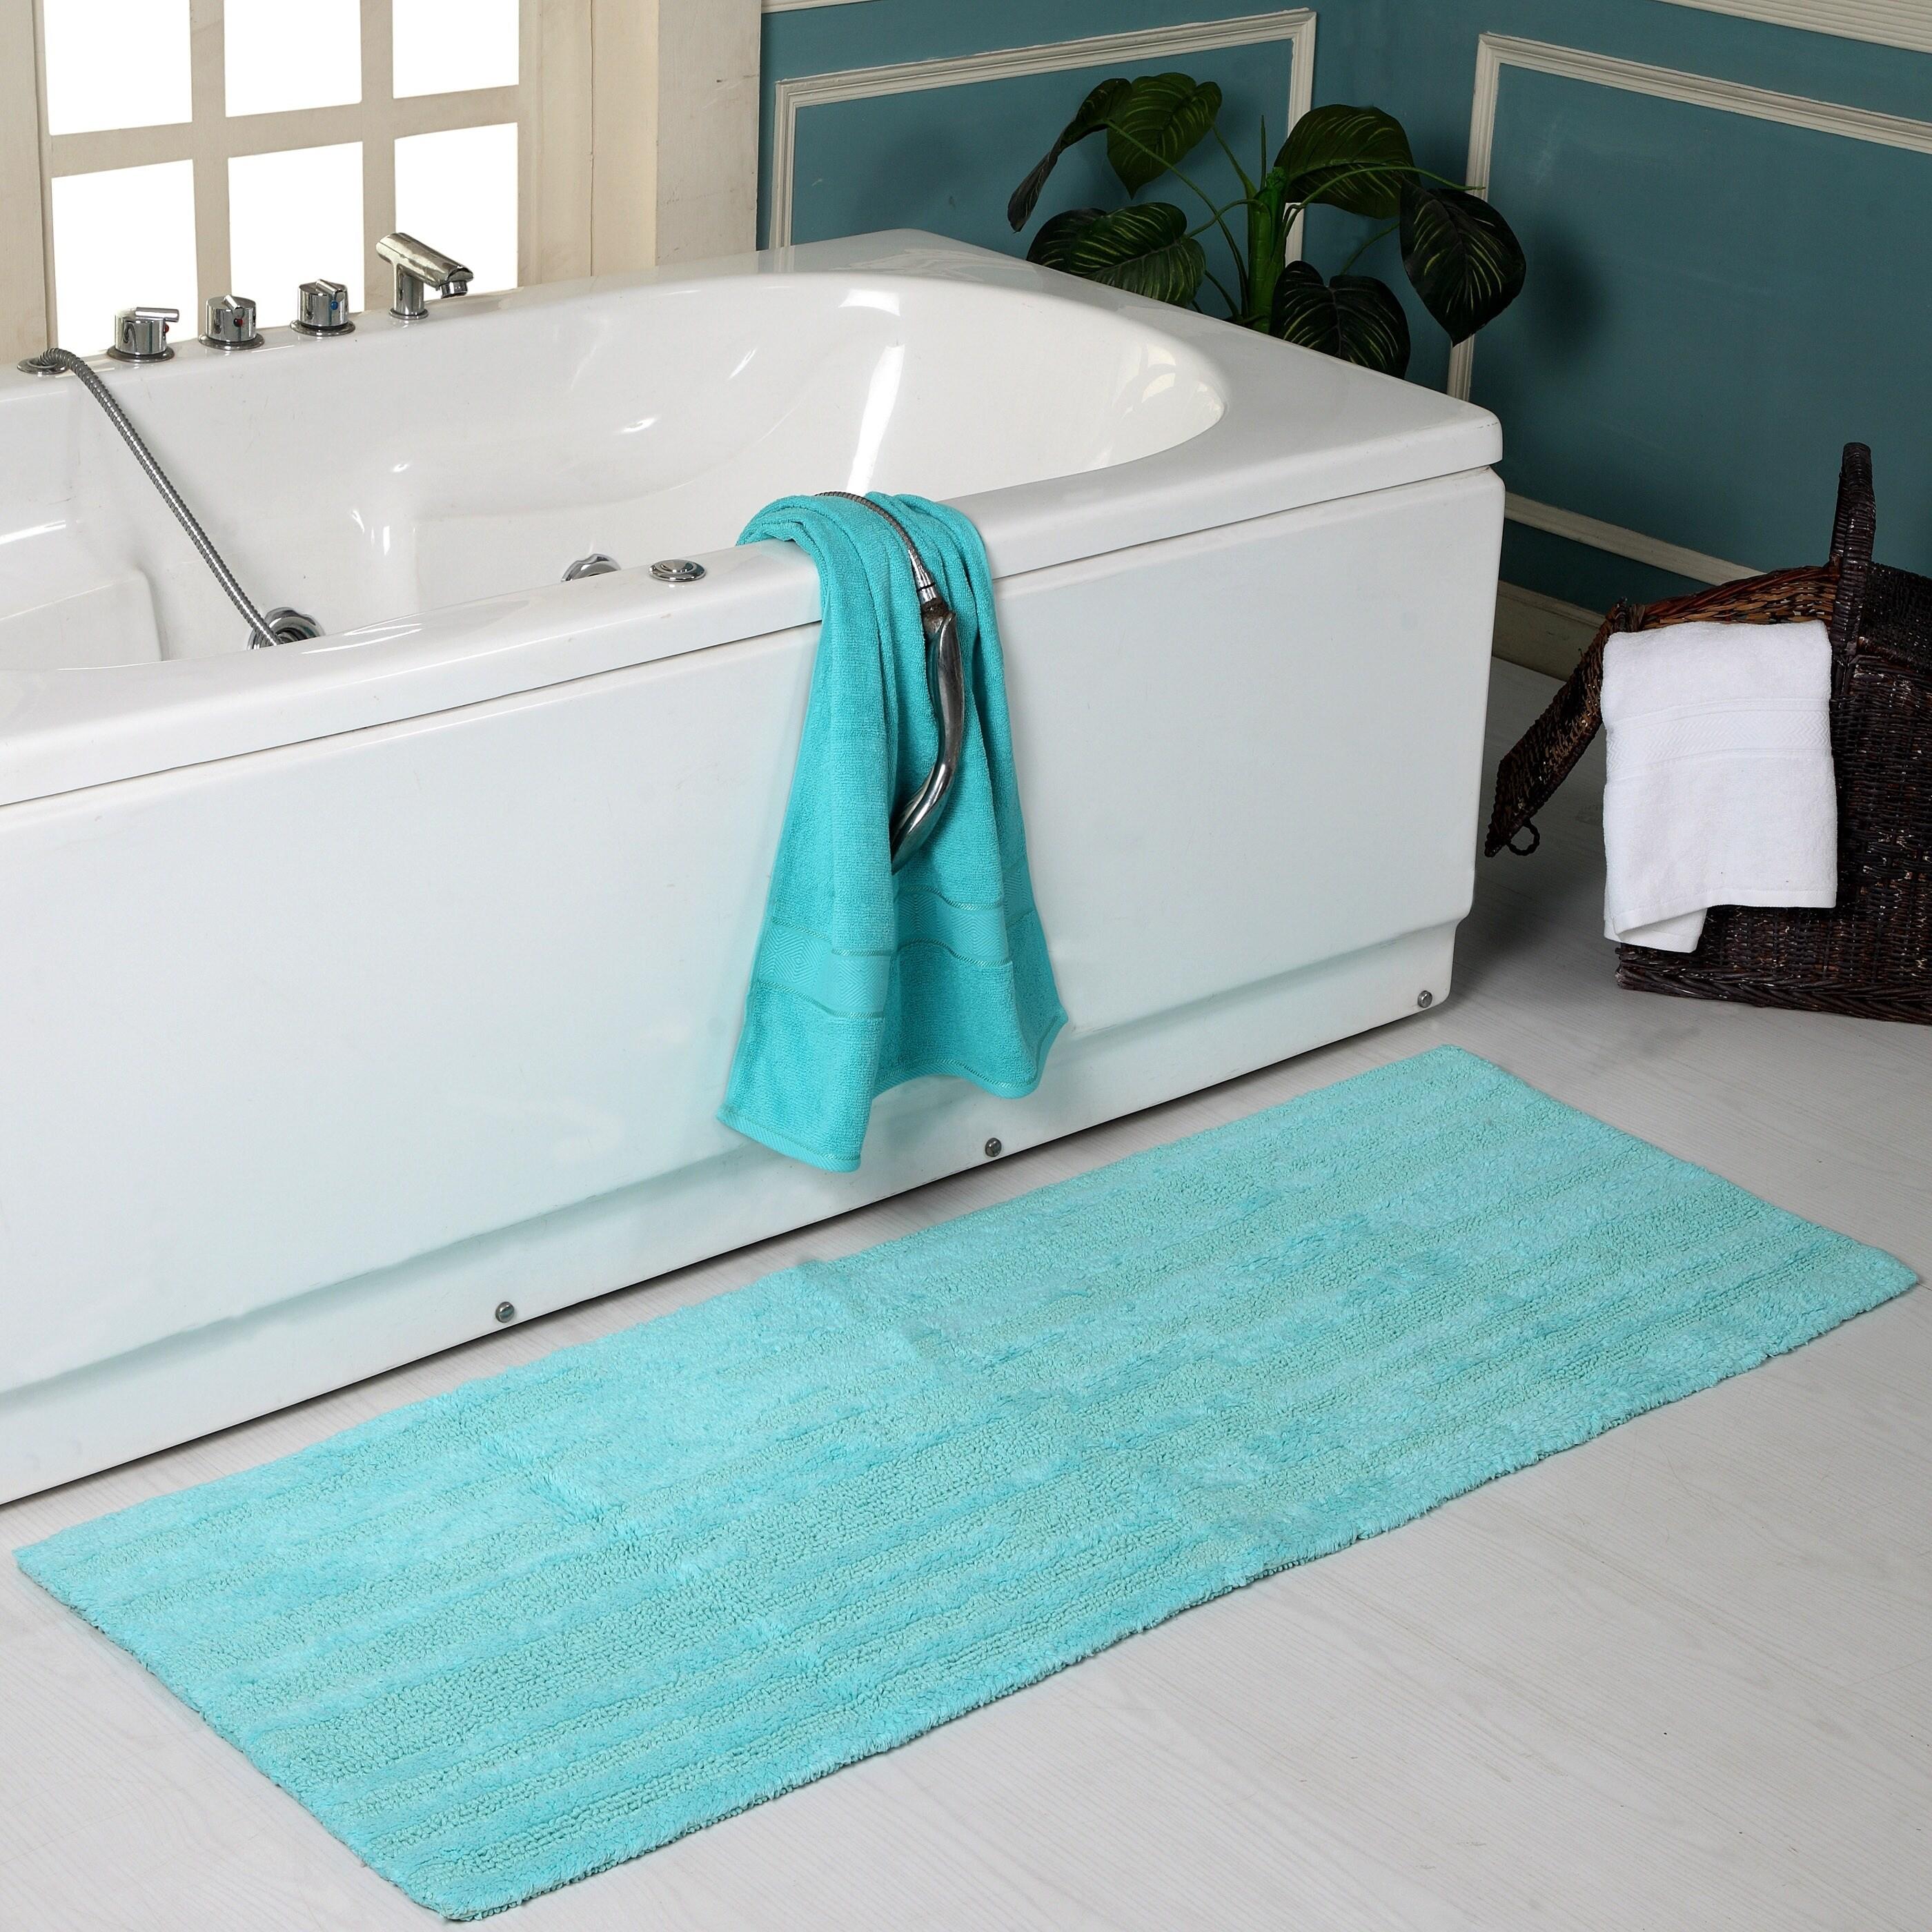 Textured Oversized 22 X 60 Bath Rug